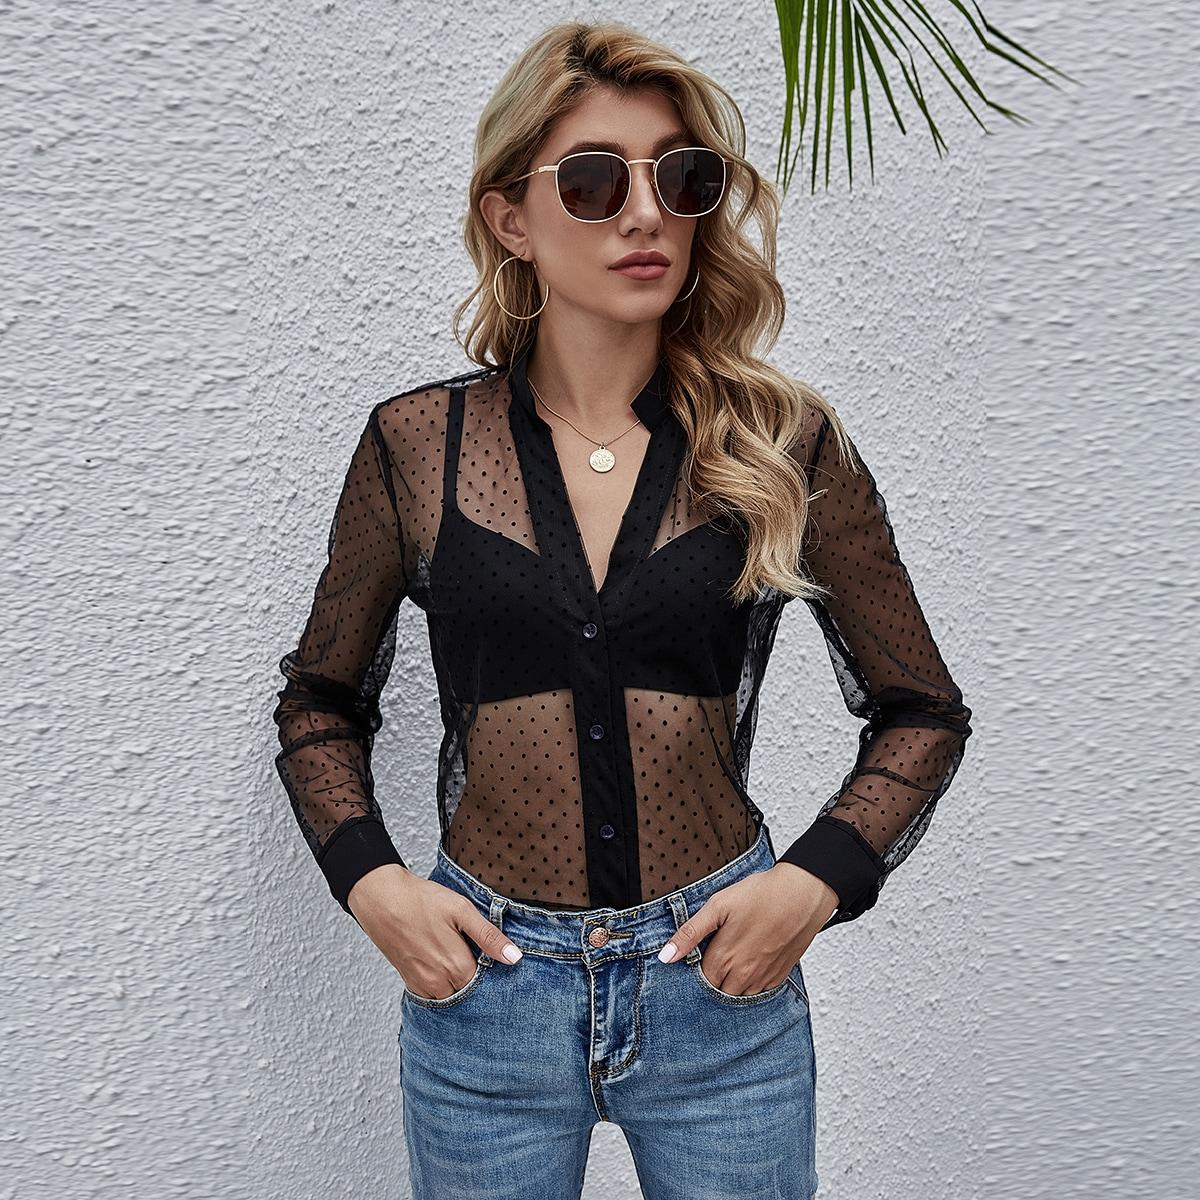 Прозрачная сетчатая блузка на пуговицах без бюстгальтера